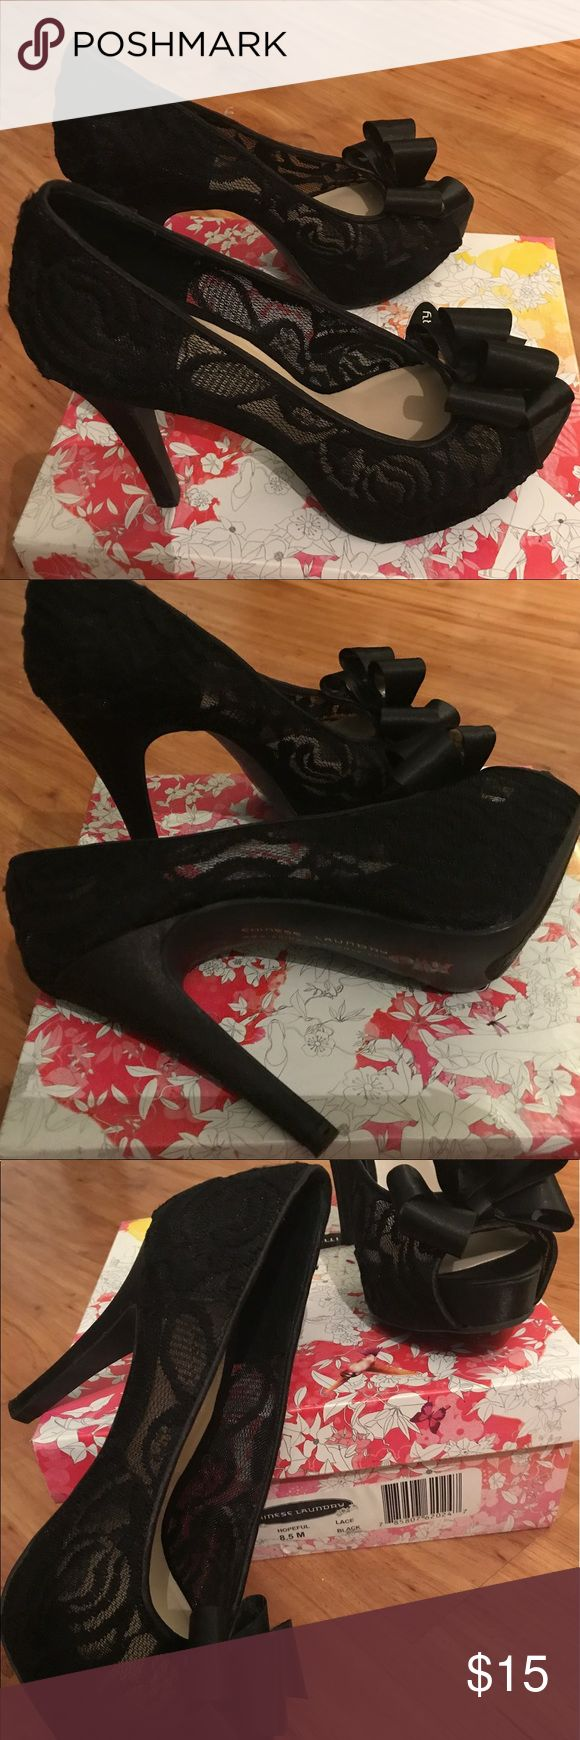 Chinese Laundry lace shoes 👠 8.5 Chinese Laundry lace shoes 👠 8.5 Chinese Laundry Shoes Heels